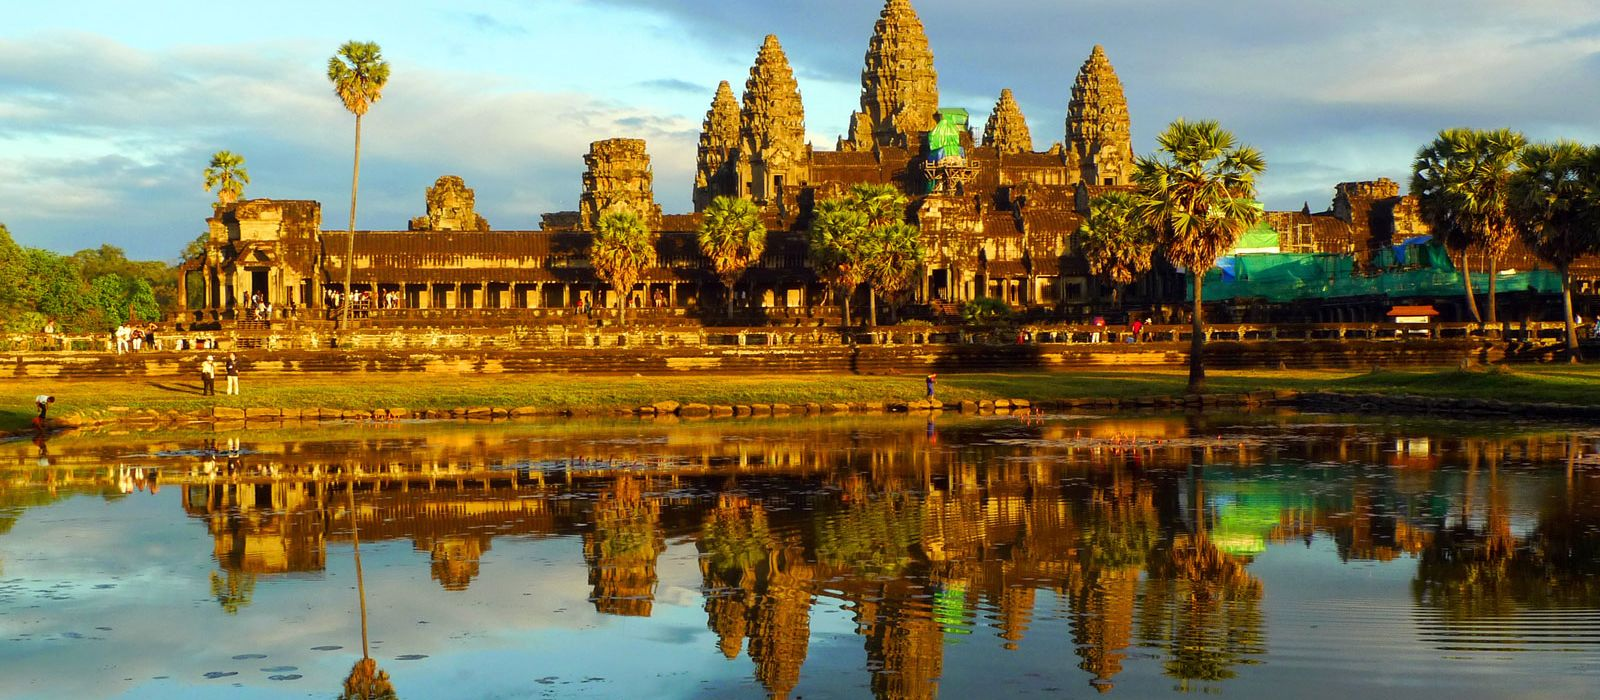 Exploring the Mekong and Phnom Penh Tour Trip 5